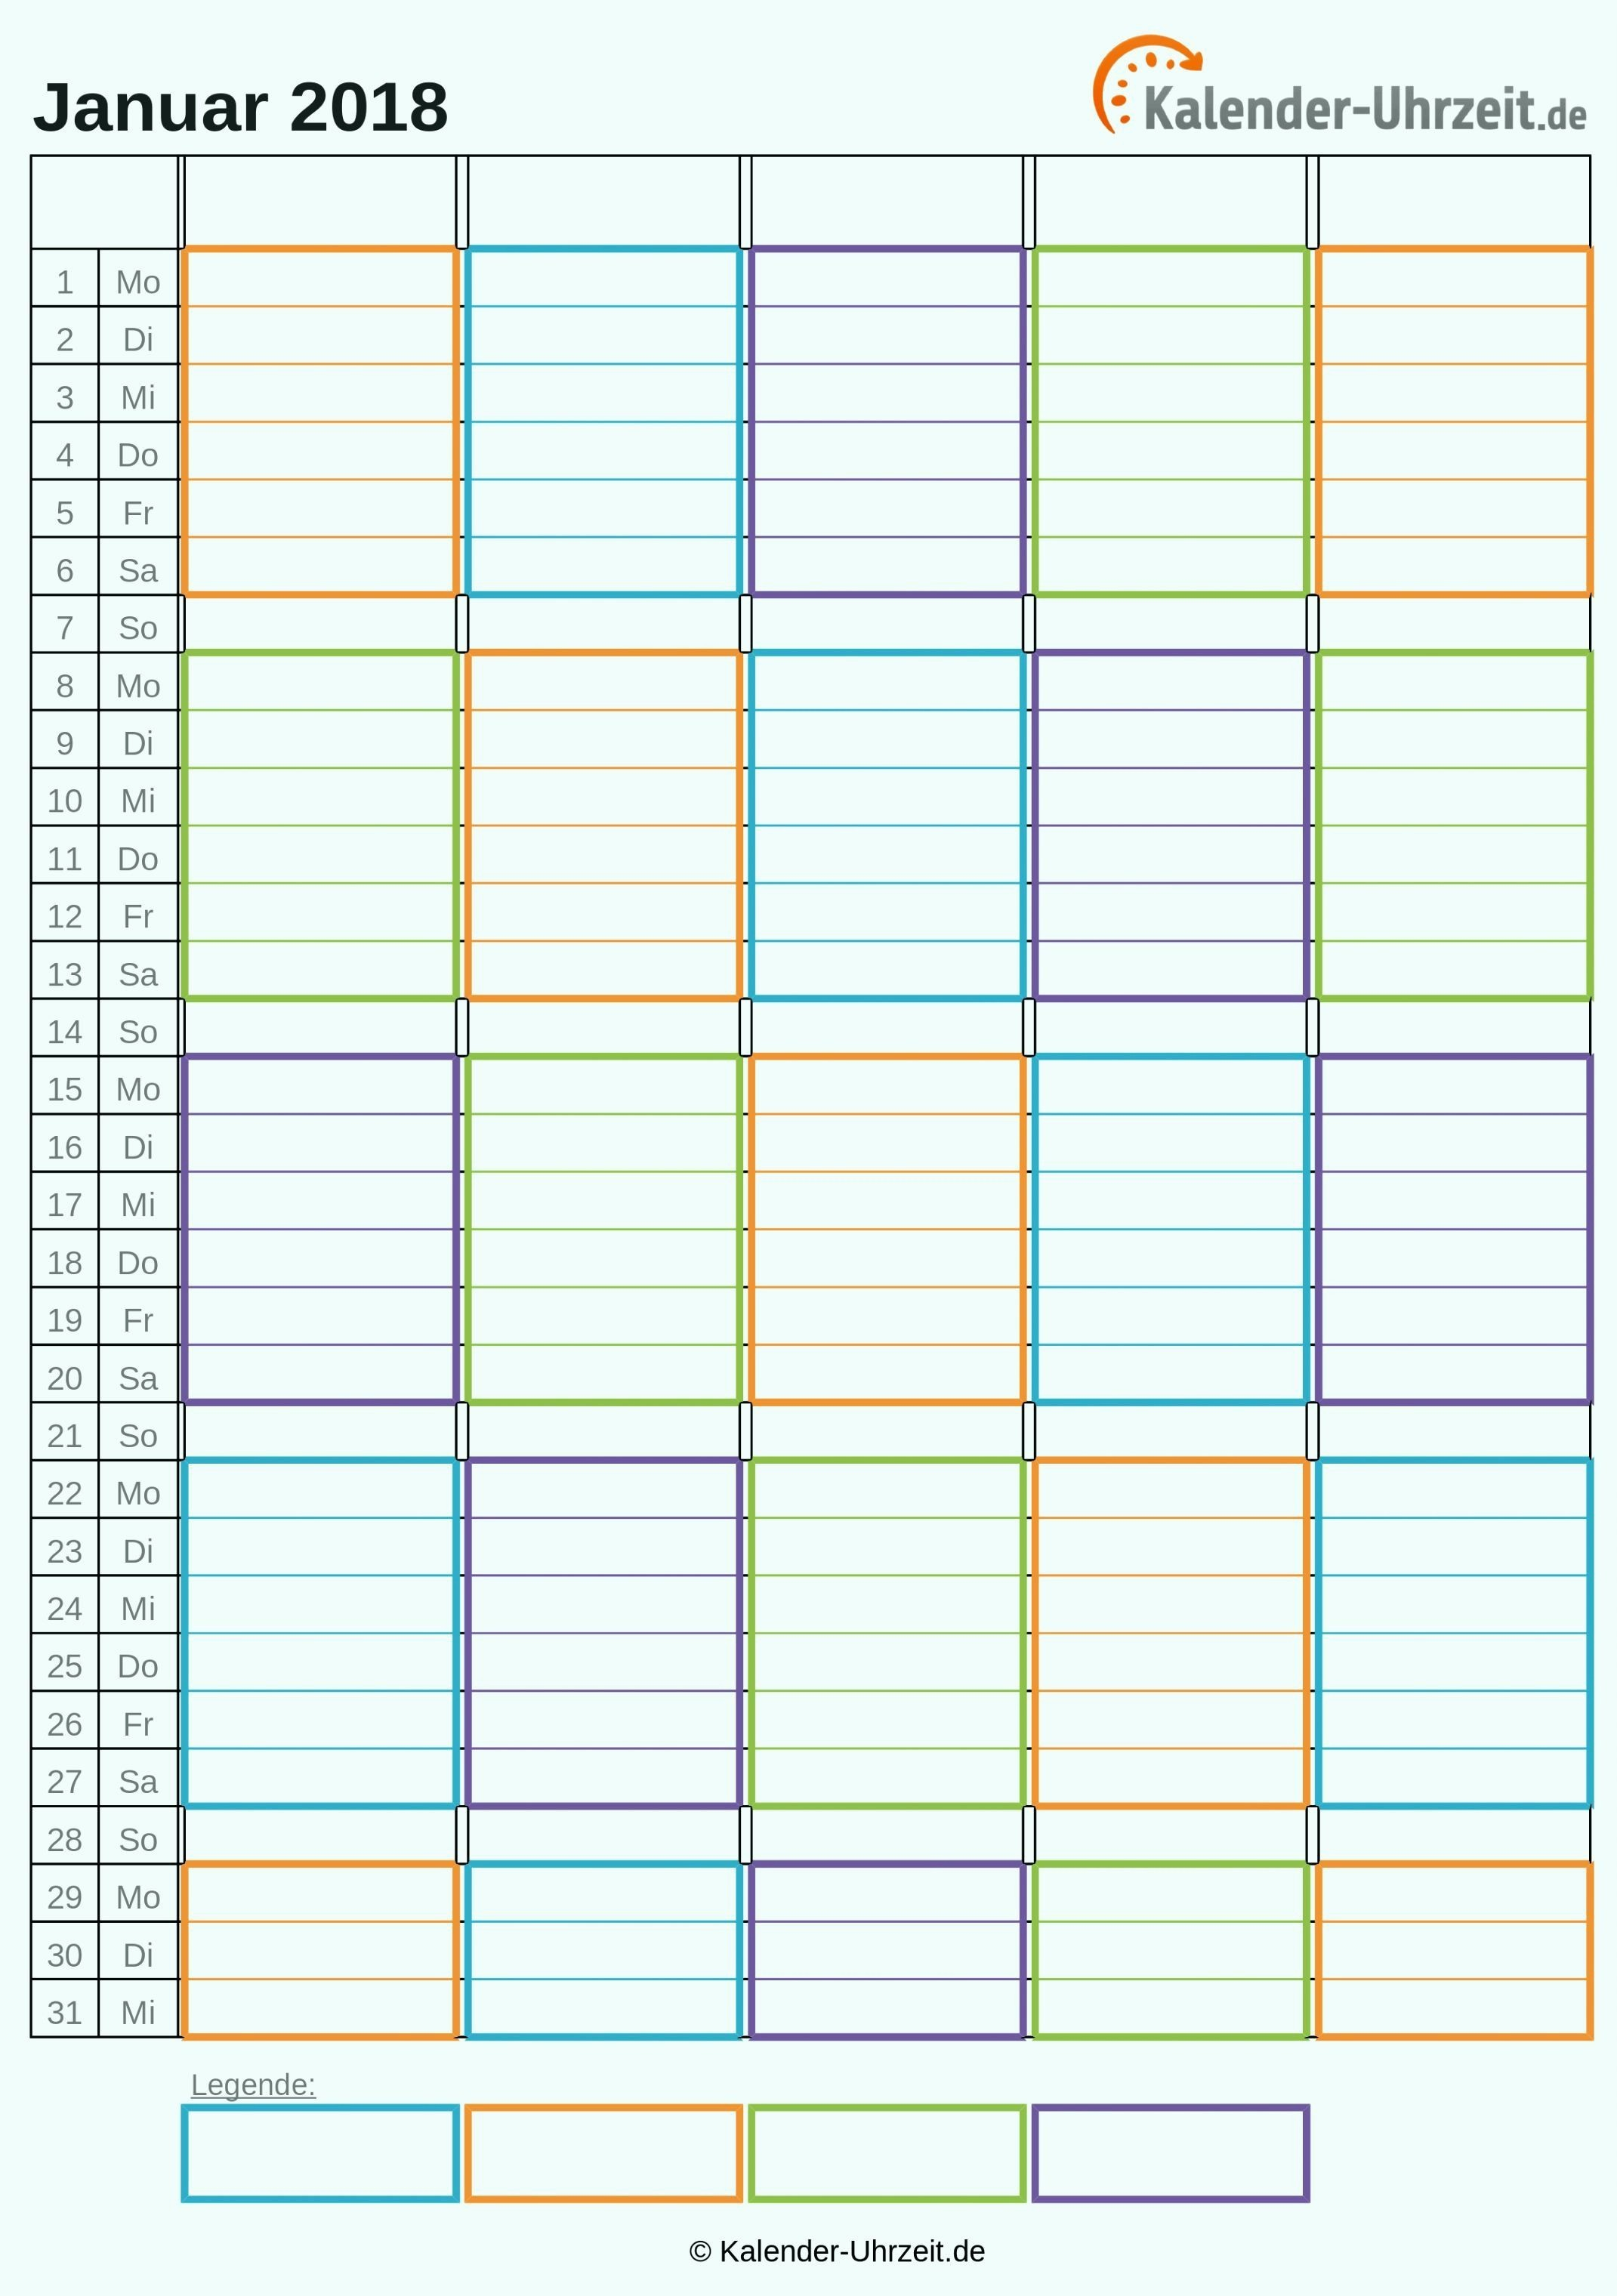 0d Calendars Kalender Kalender 2016 Zum Drucken Typen Kalender Erstellen Line Excel Kalender Einfügen Dann sonaphone